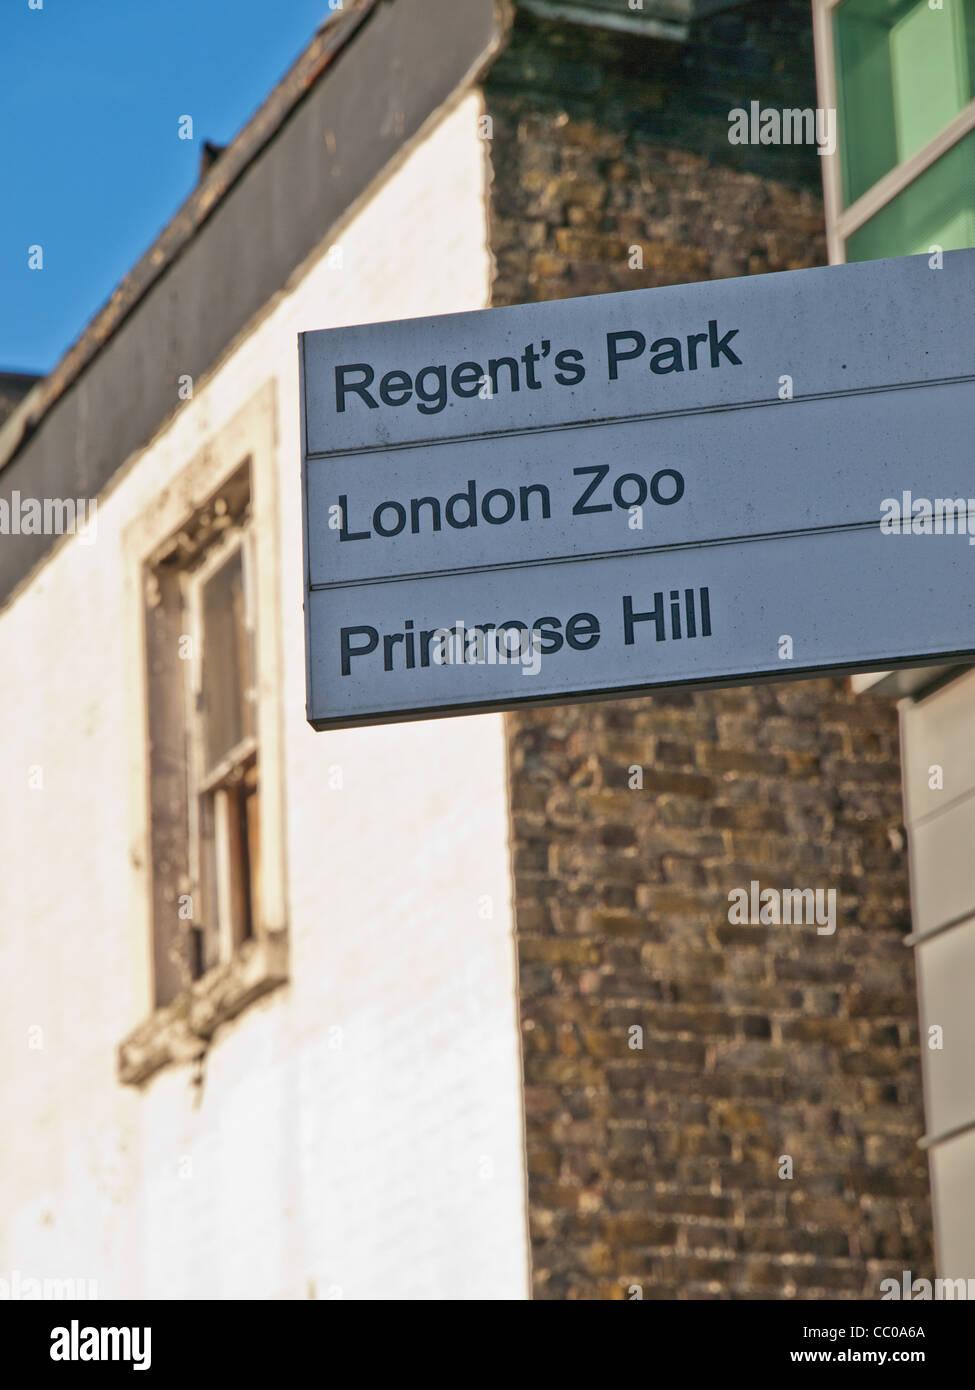 Primrose Hill Sign - Stock Image